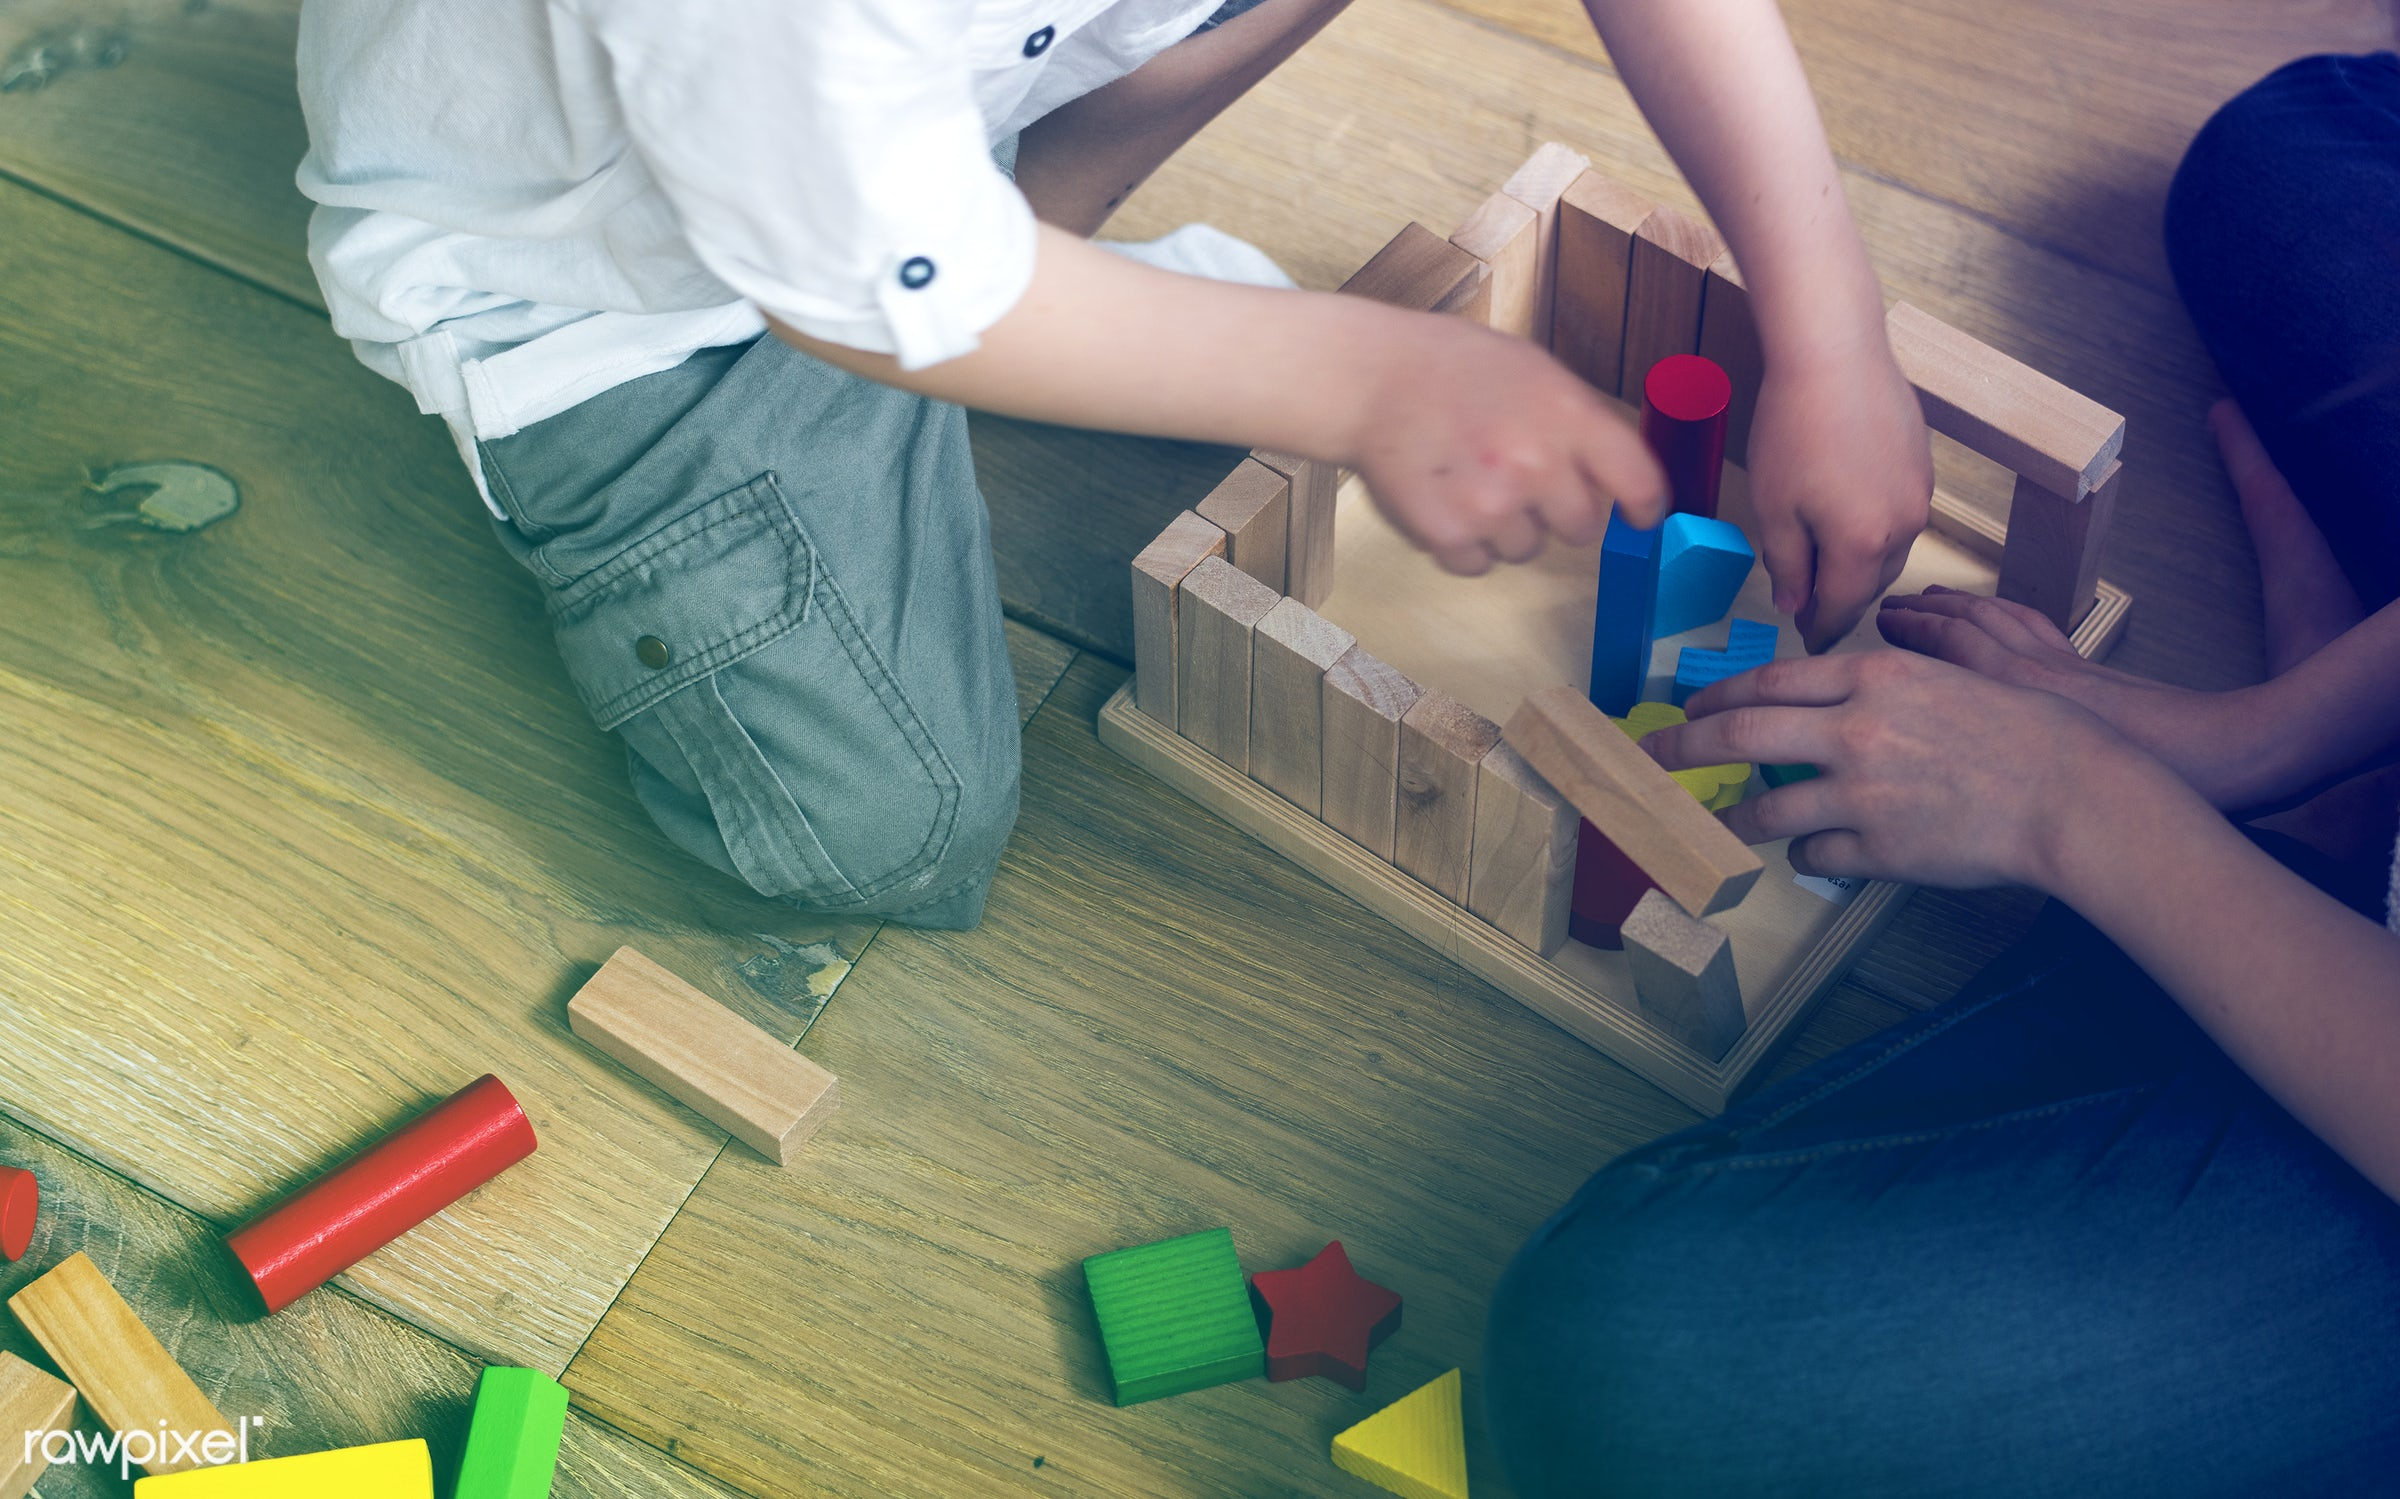 wood, toy blocks, faded, little, entertain, vibrant, wooden blocks, kid, love, family, blend, smile, cheerful, light,...